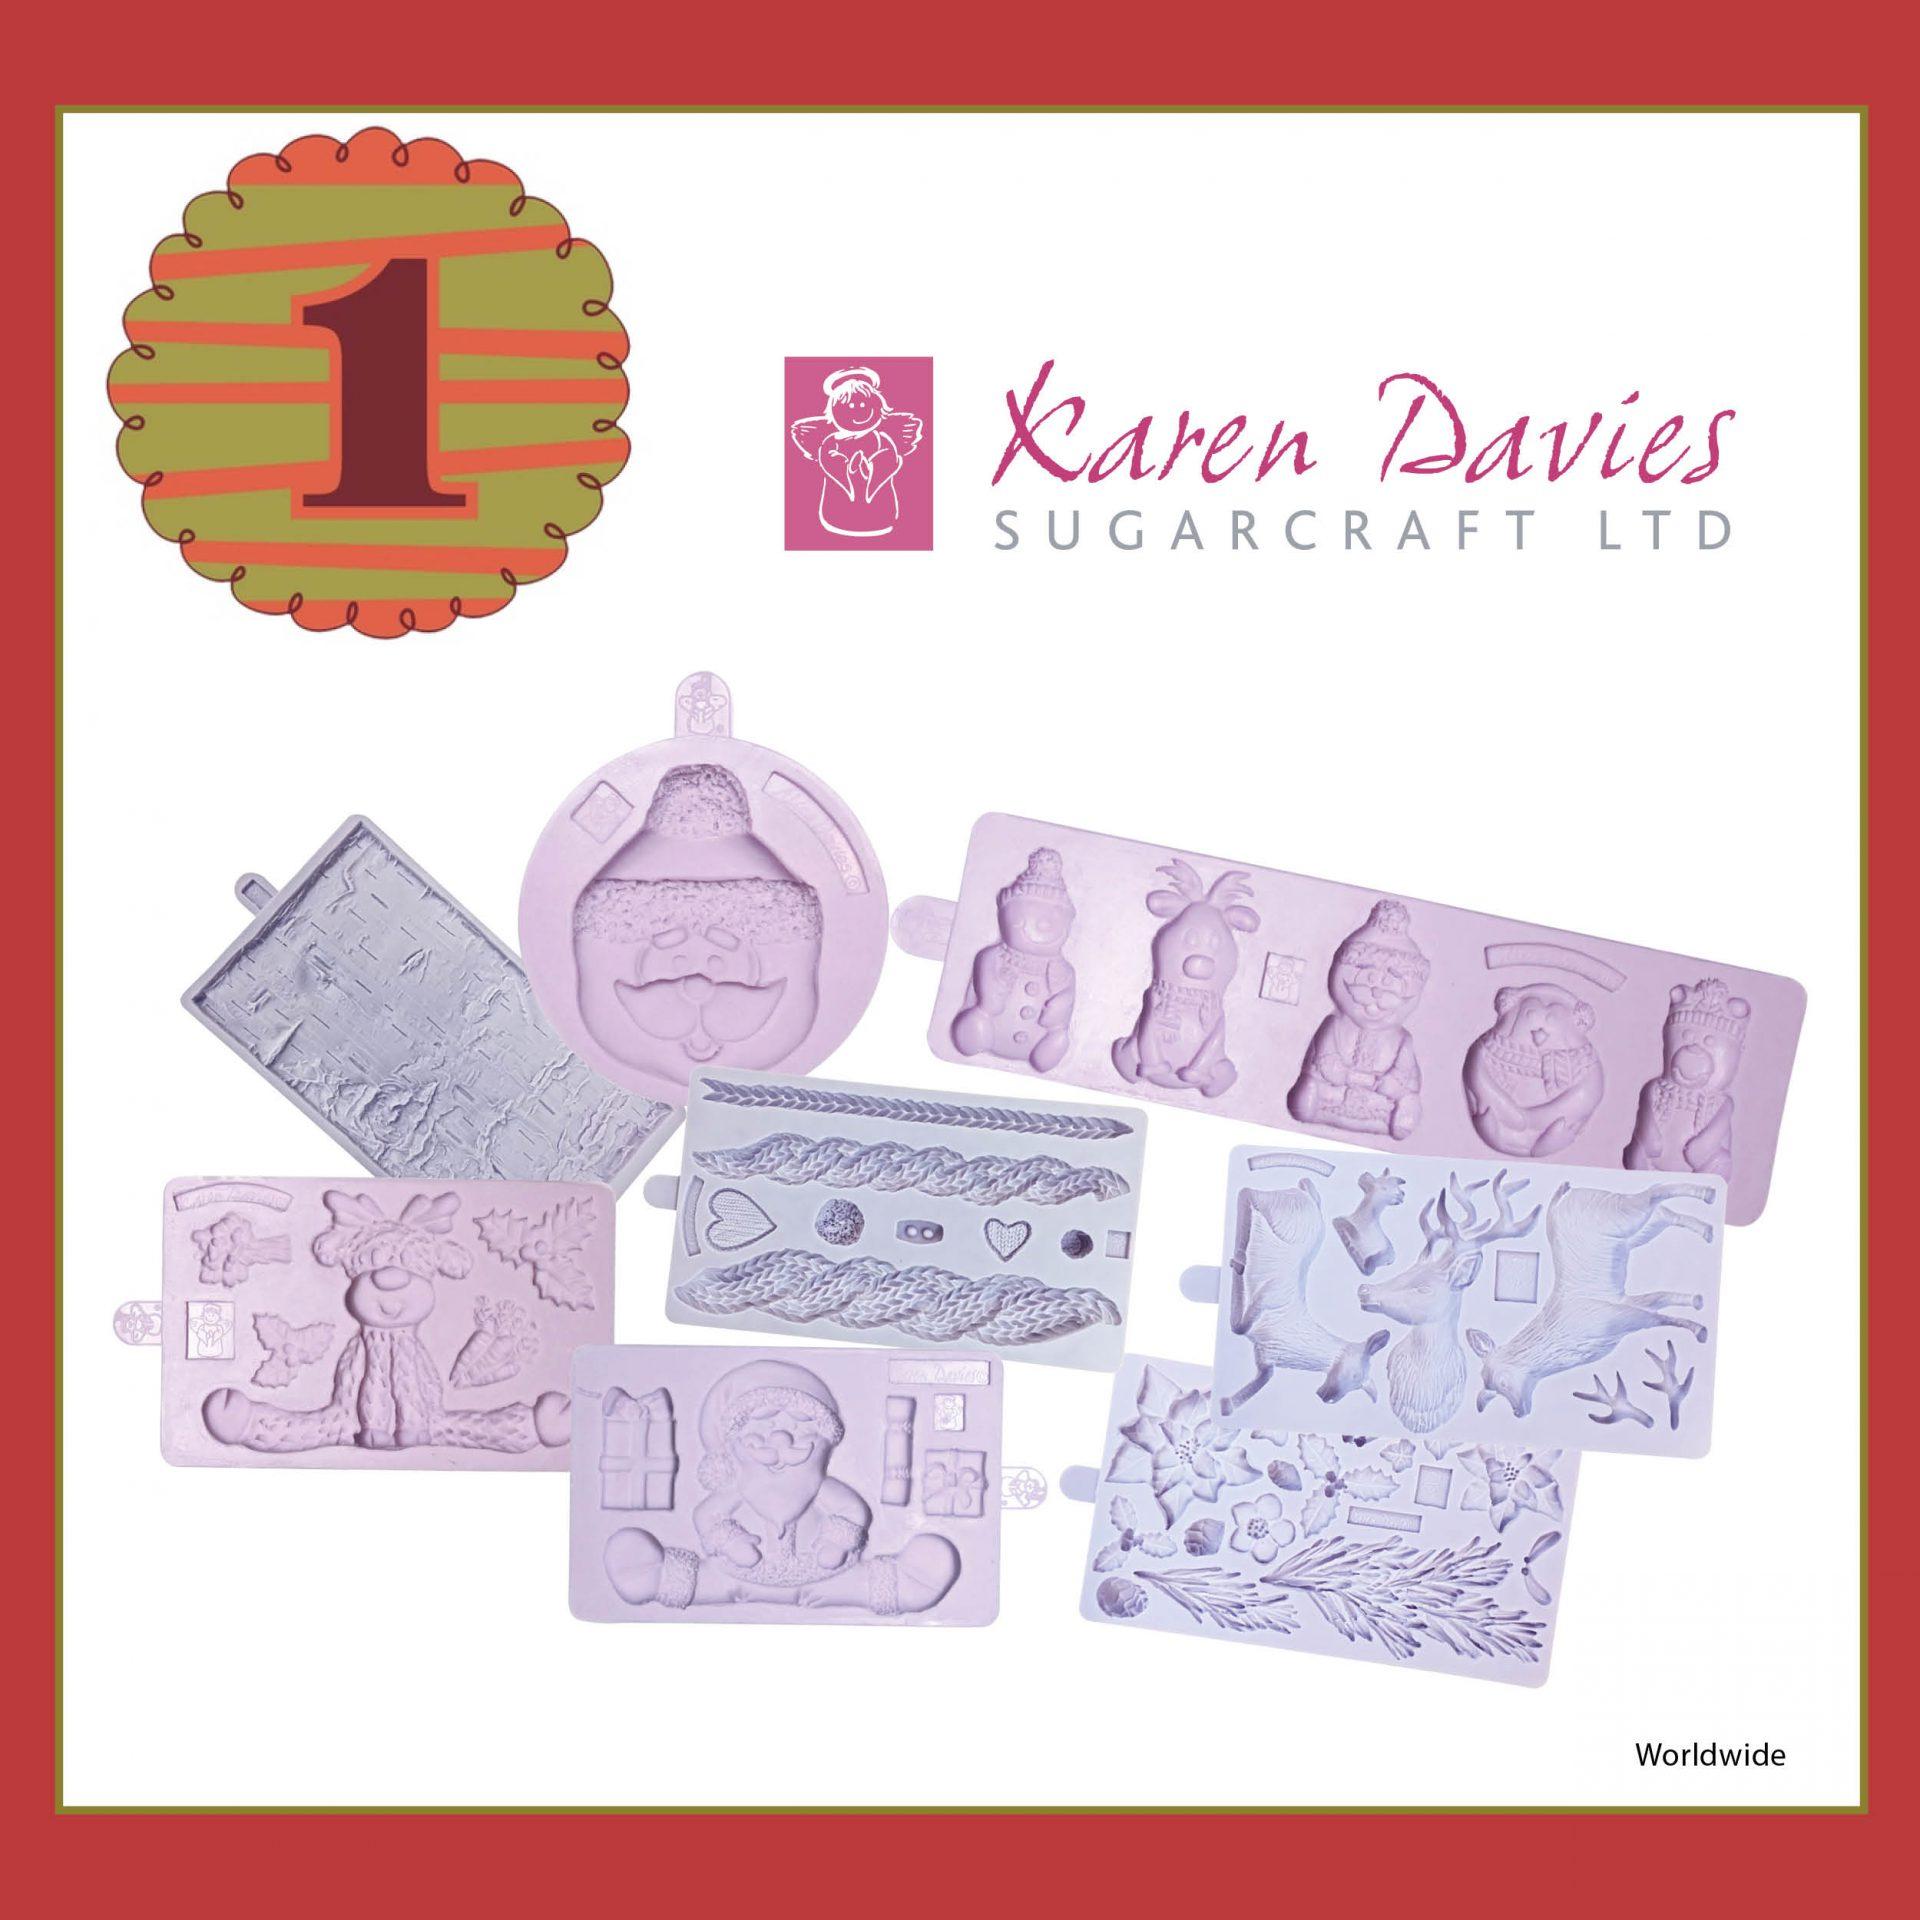 1st-december-karen-davies